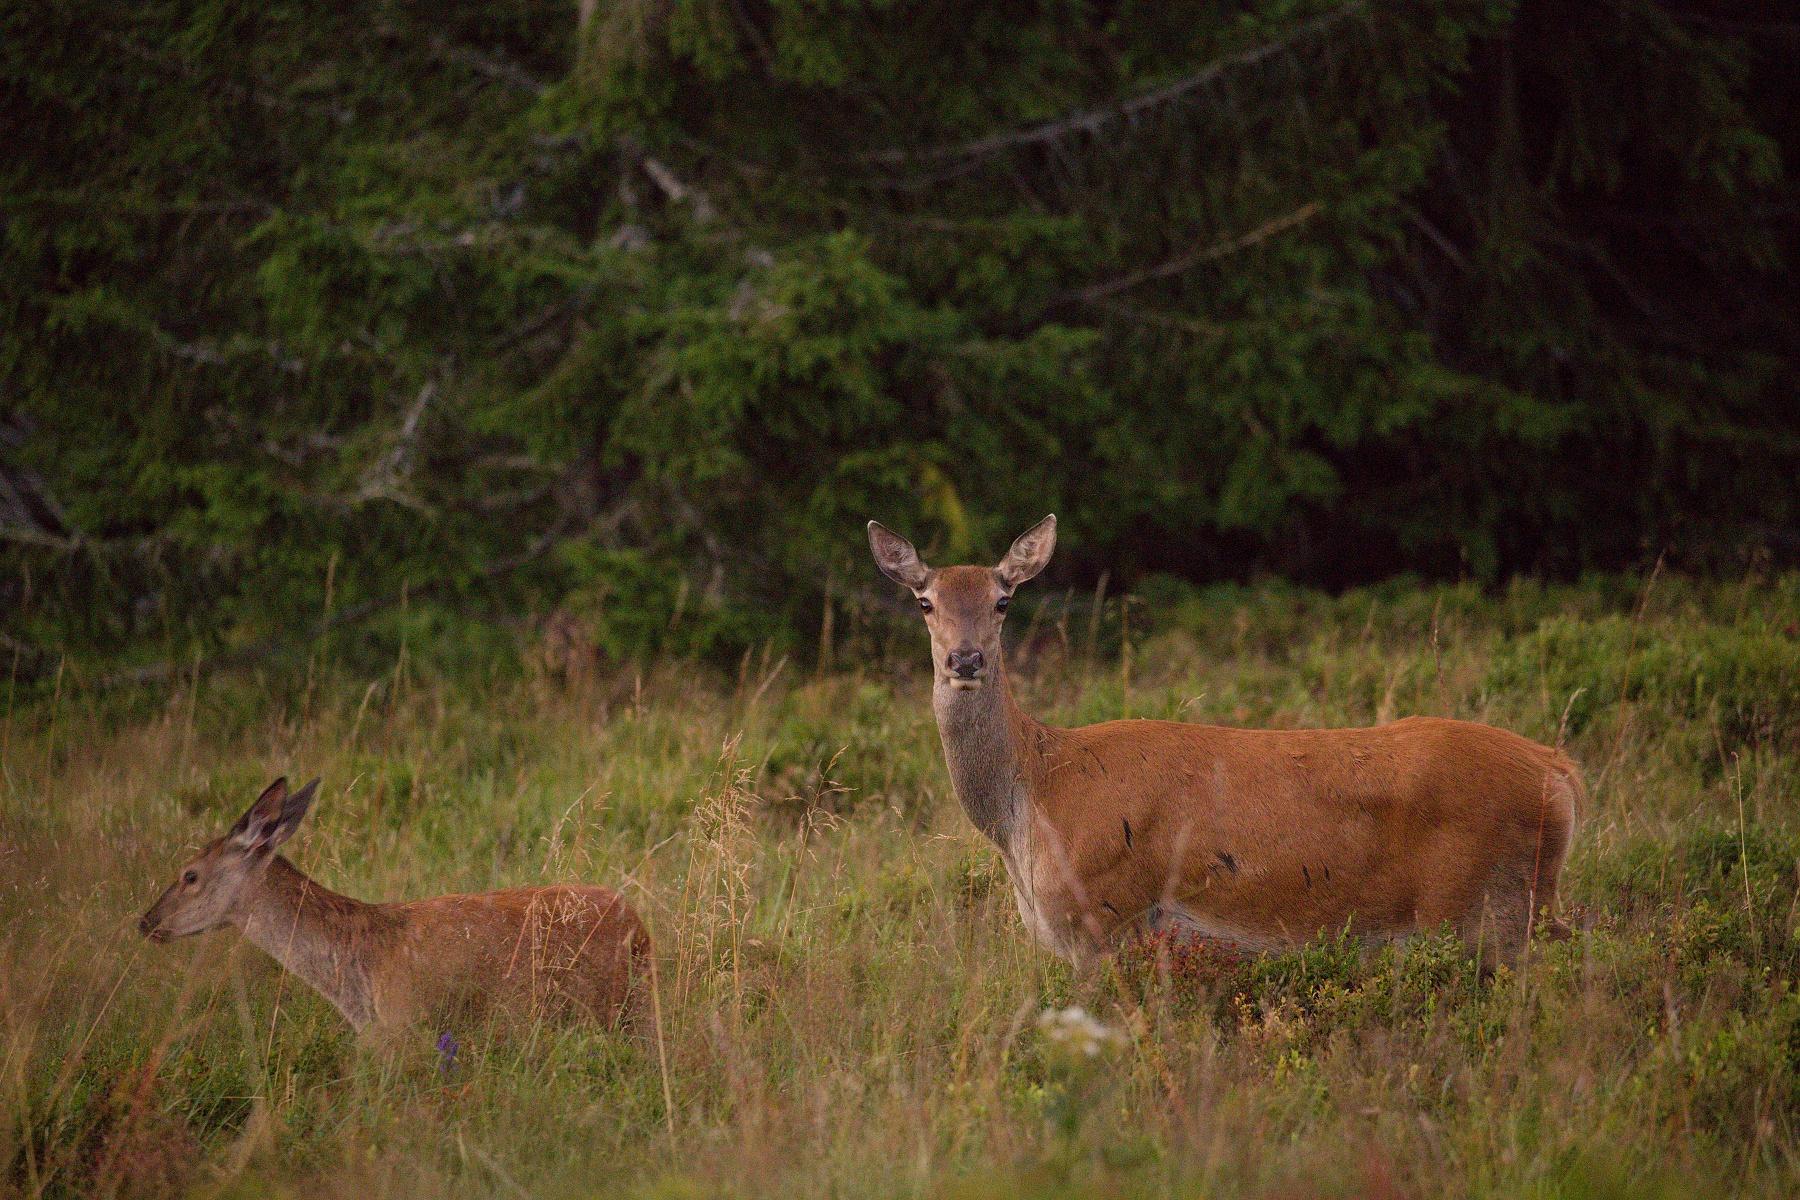 jeleň lesný (Cervus elaphus) Red deer, Veľká Fatra, Slovensko (4)